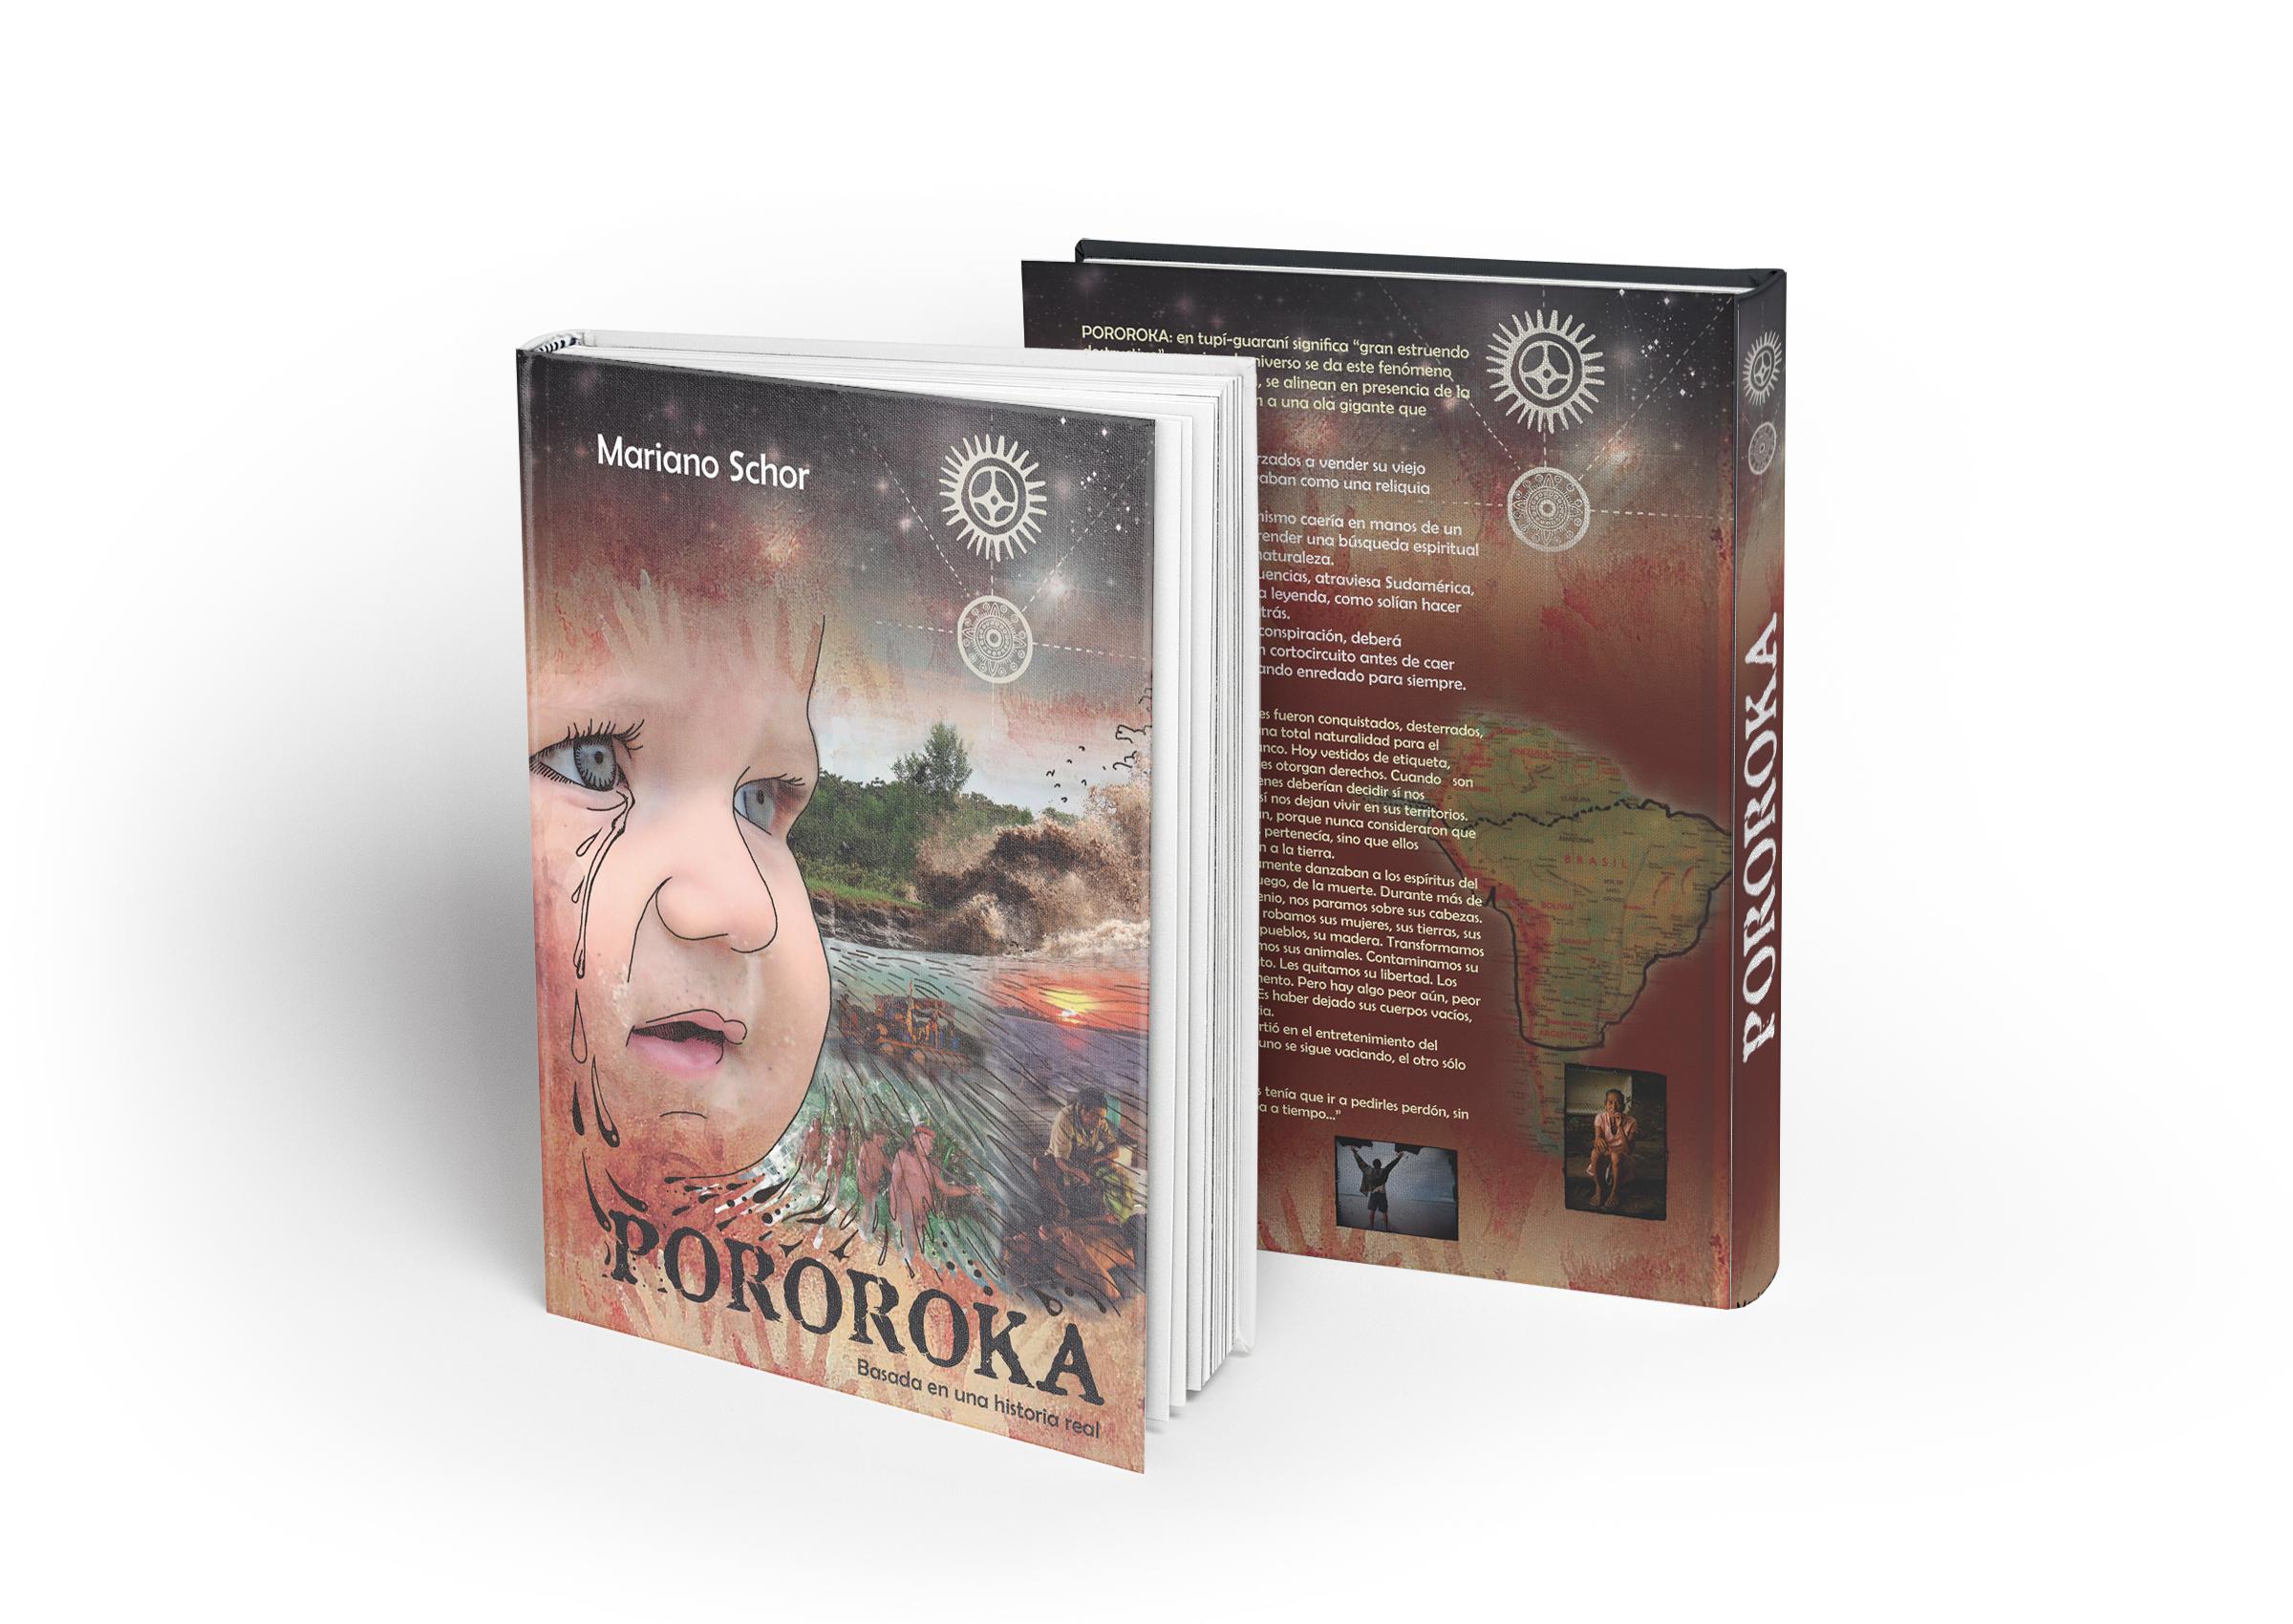 pororoka2